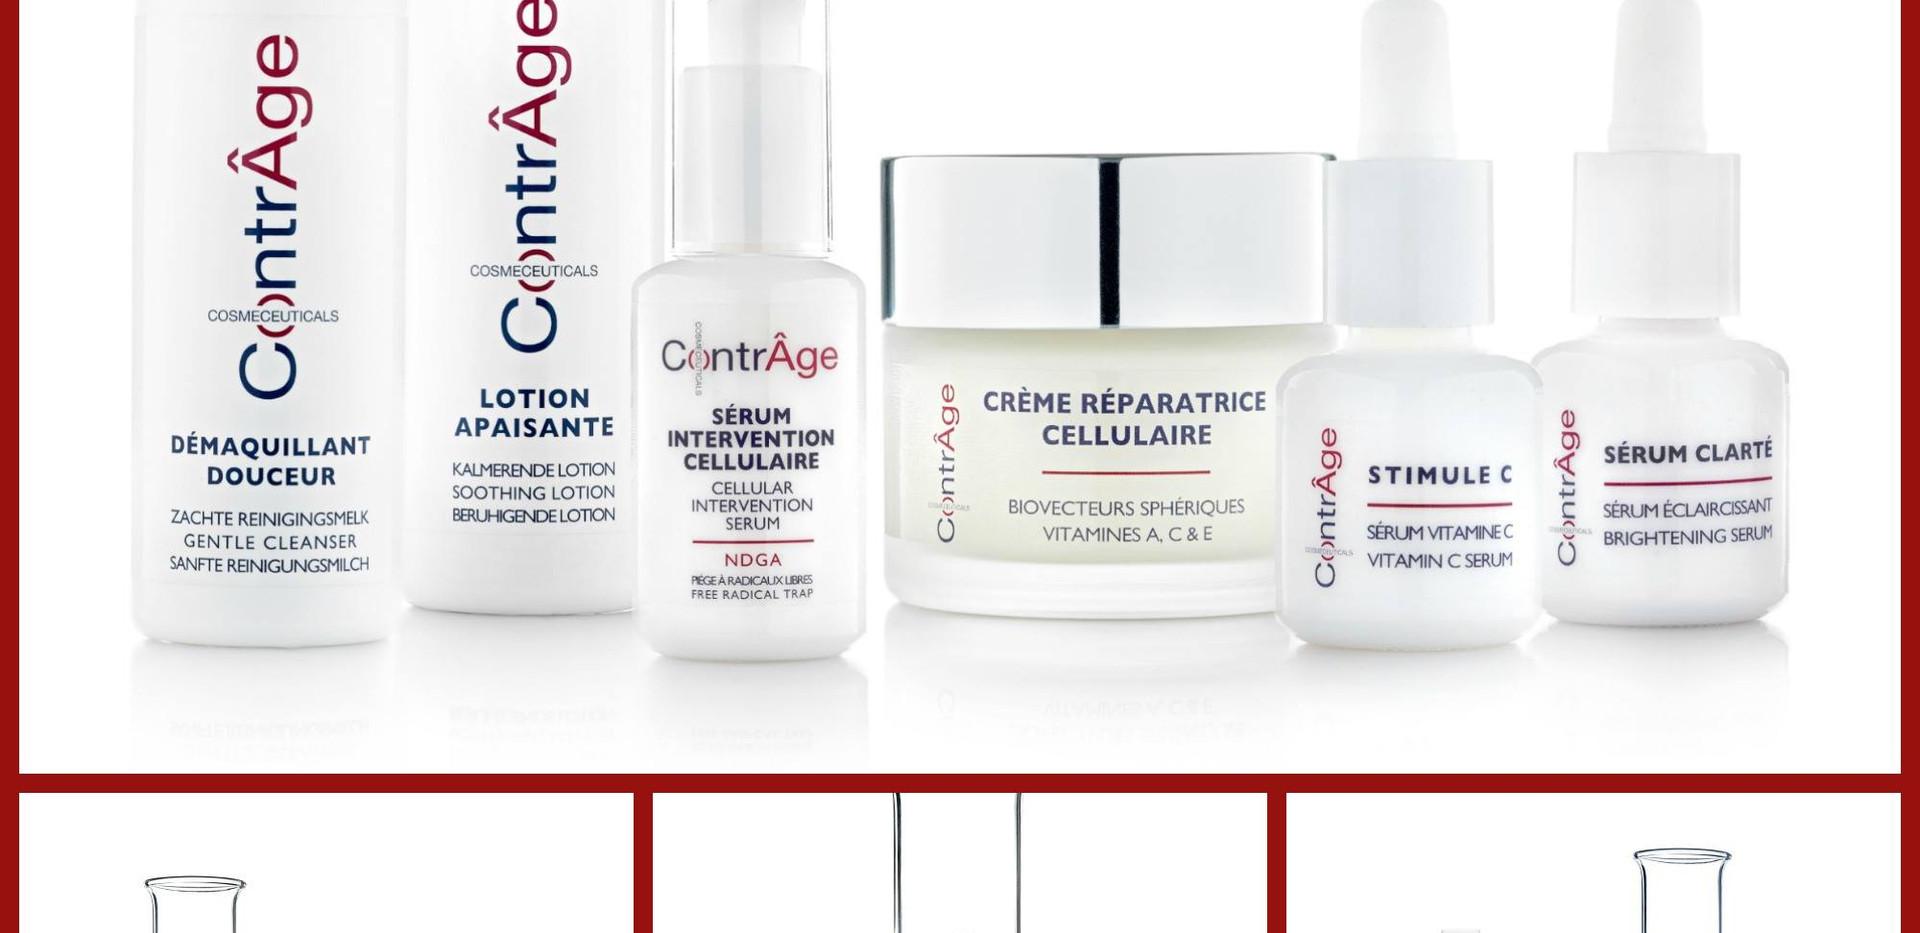 cerepharma products 2.jpg